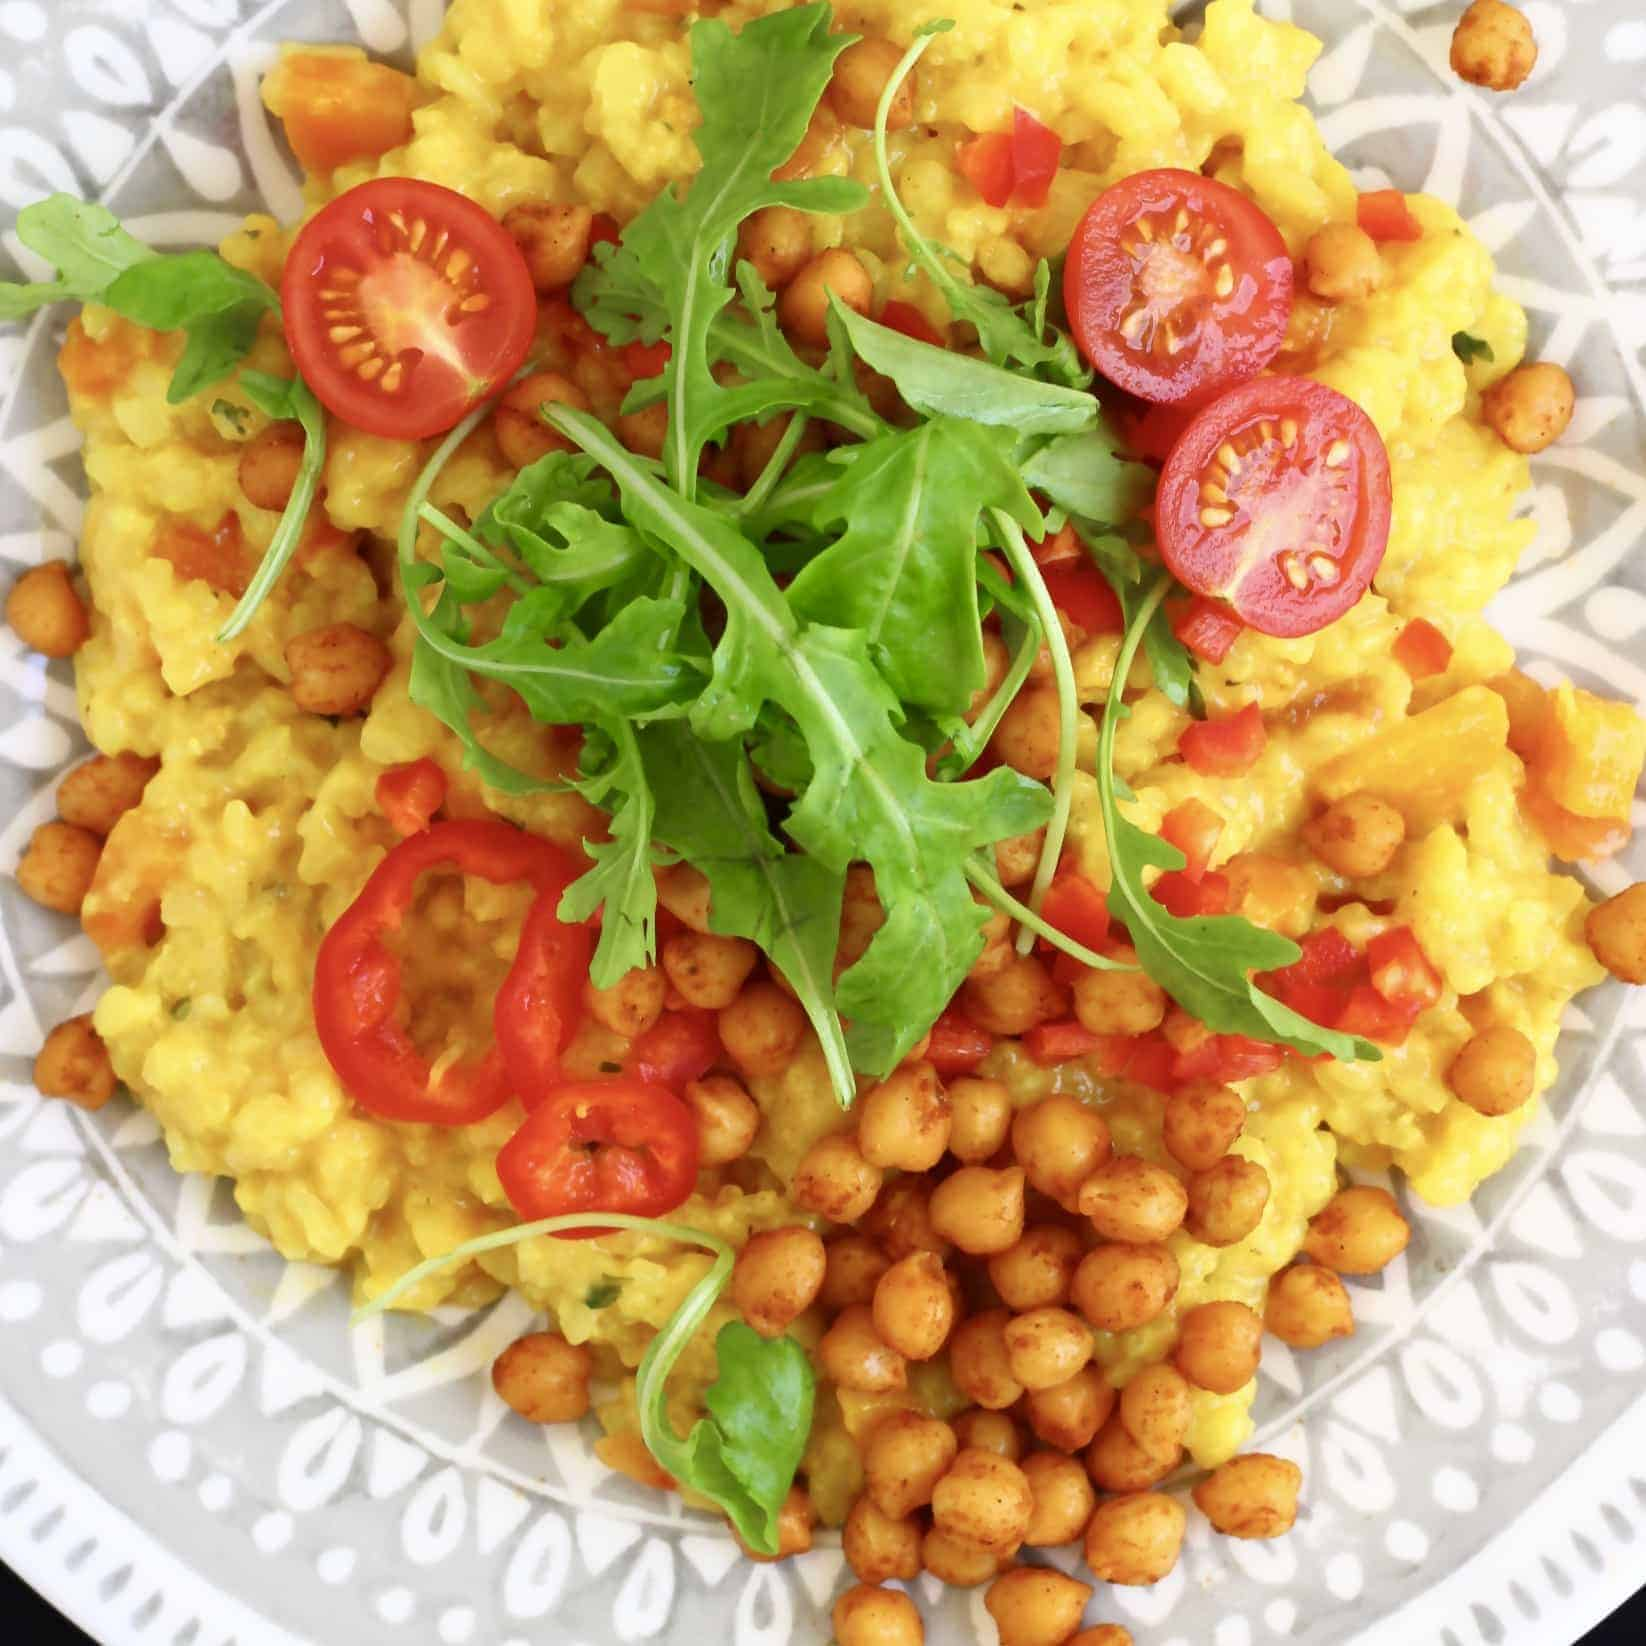 Vegan Spanish Risotto With Crispy Chickpeas (GF)